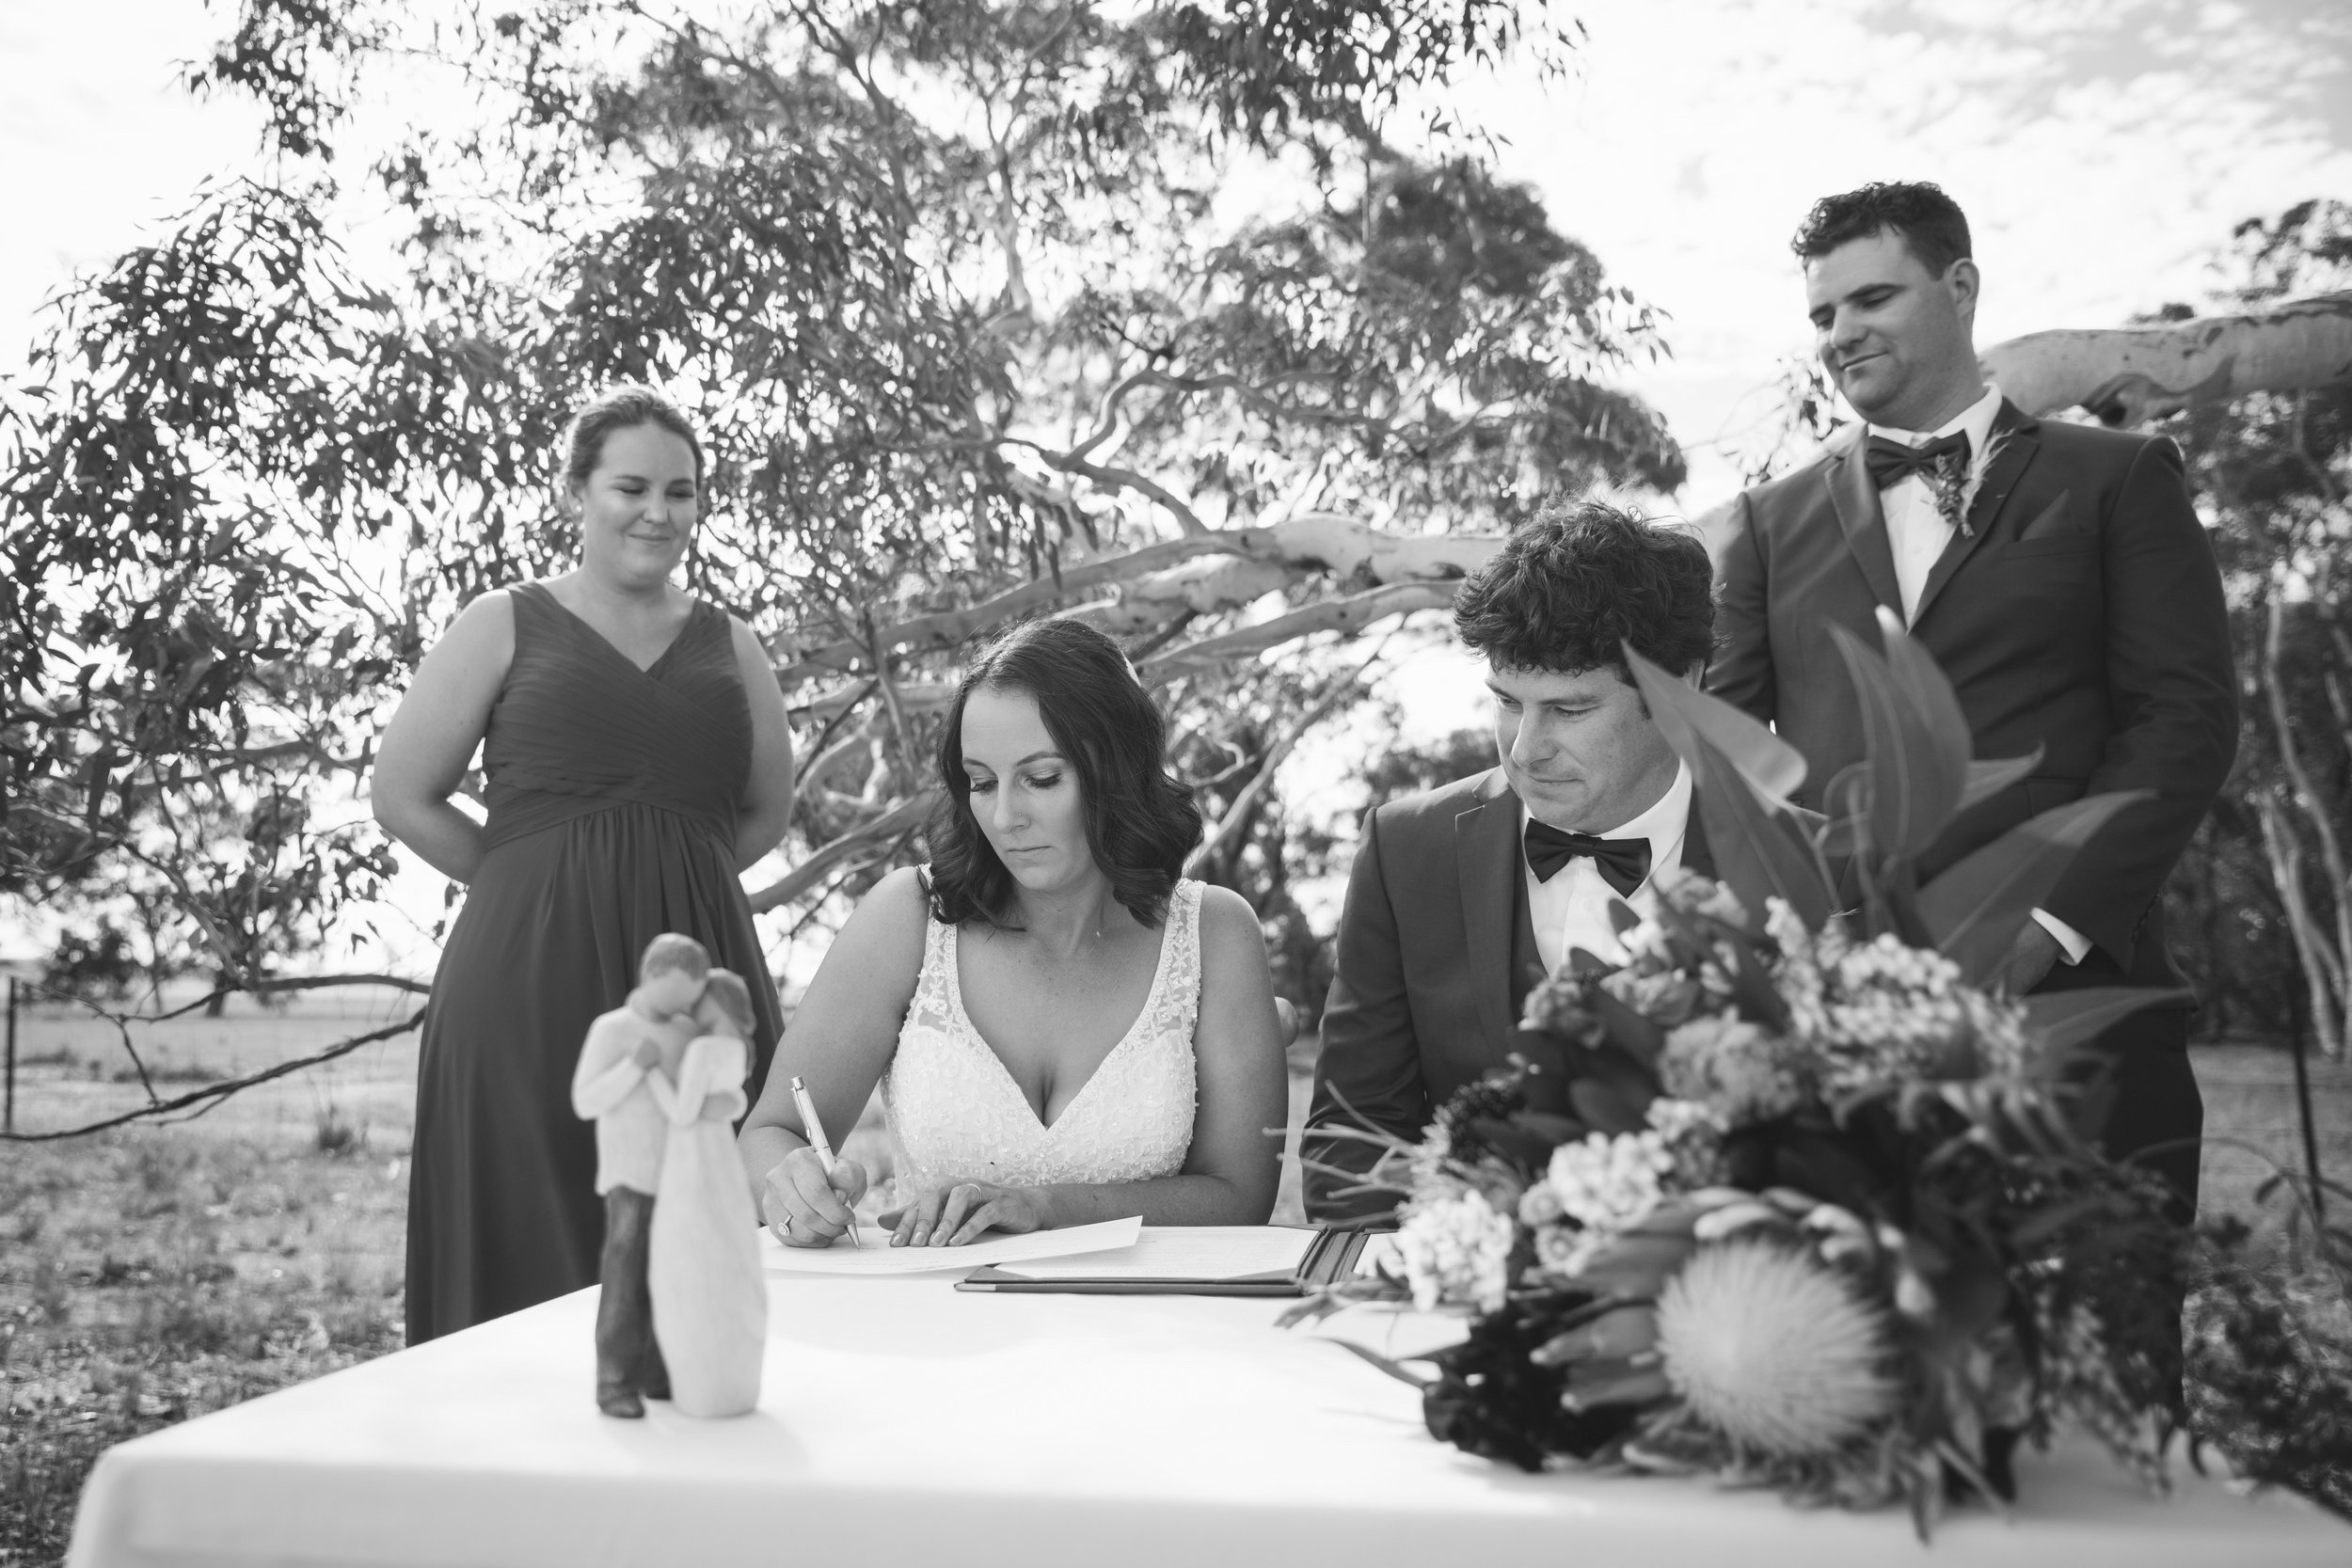 Angie Roe Photography Wheatbelt Avon Valley Farm Wedding (25).jpg